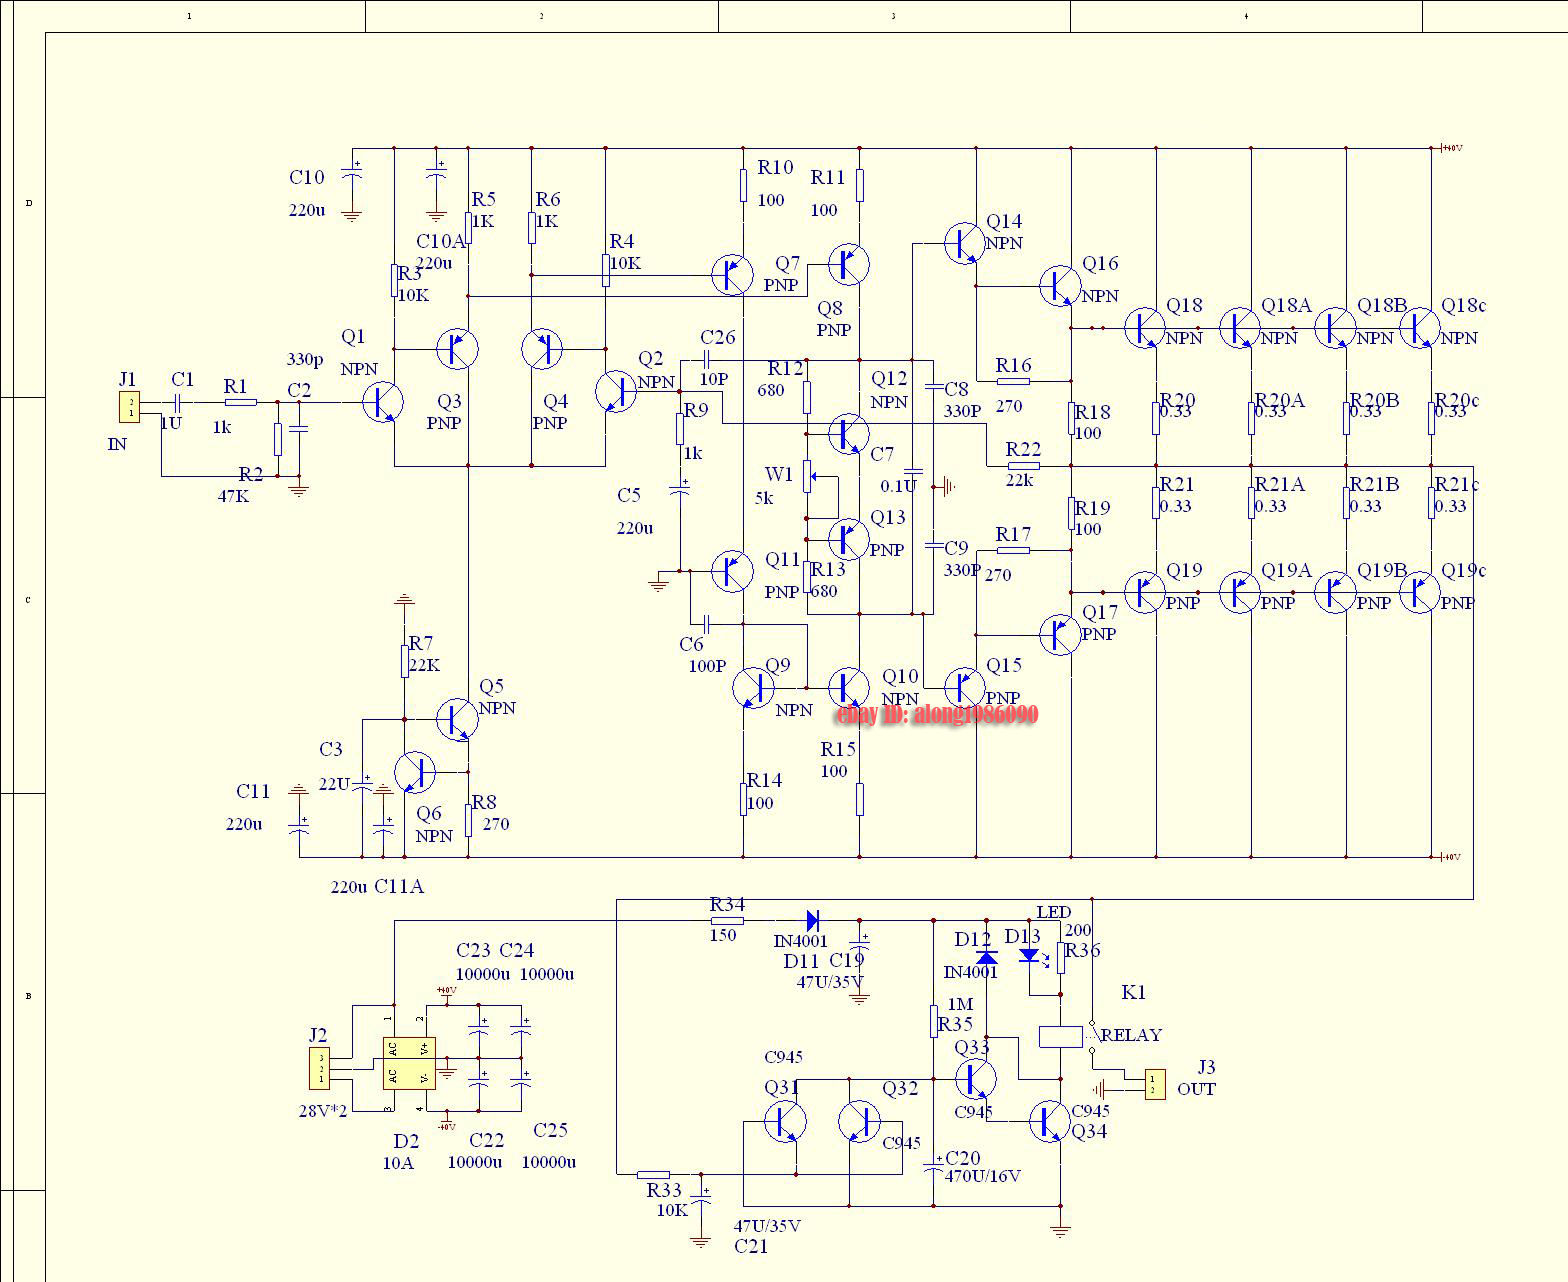 cyrus 1 circuit diagram wiring diagram split cyrus 1 circuit diagram [ 1568 x 1282 Pixel ]